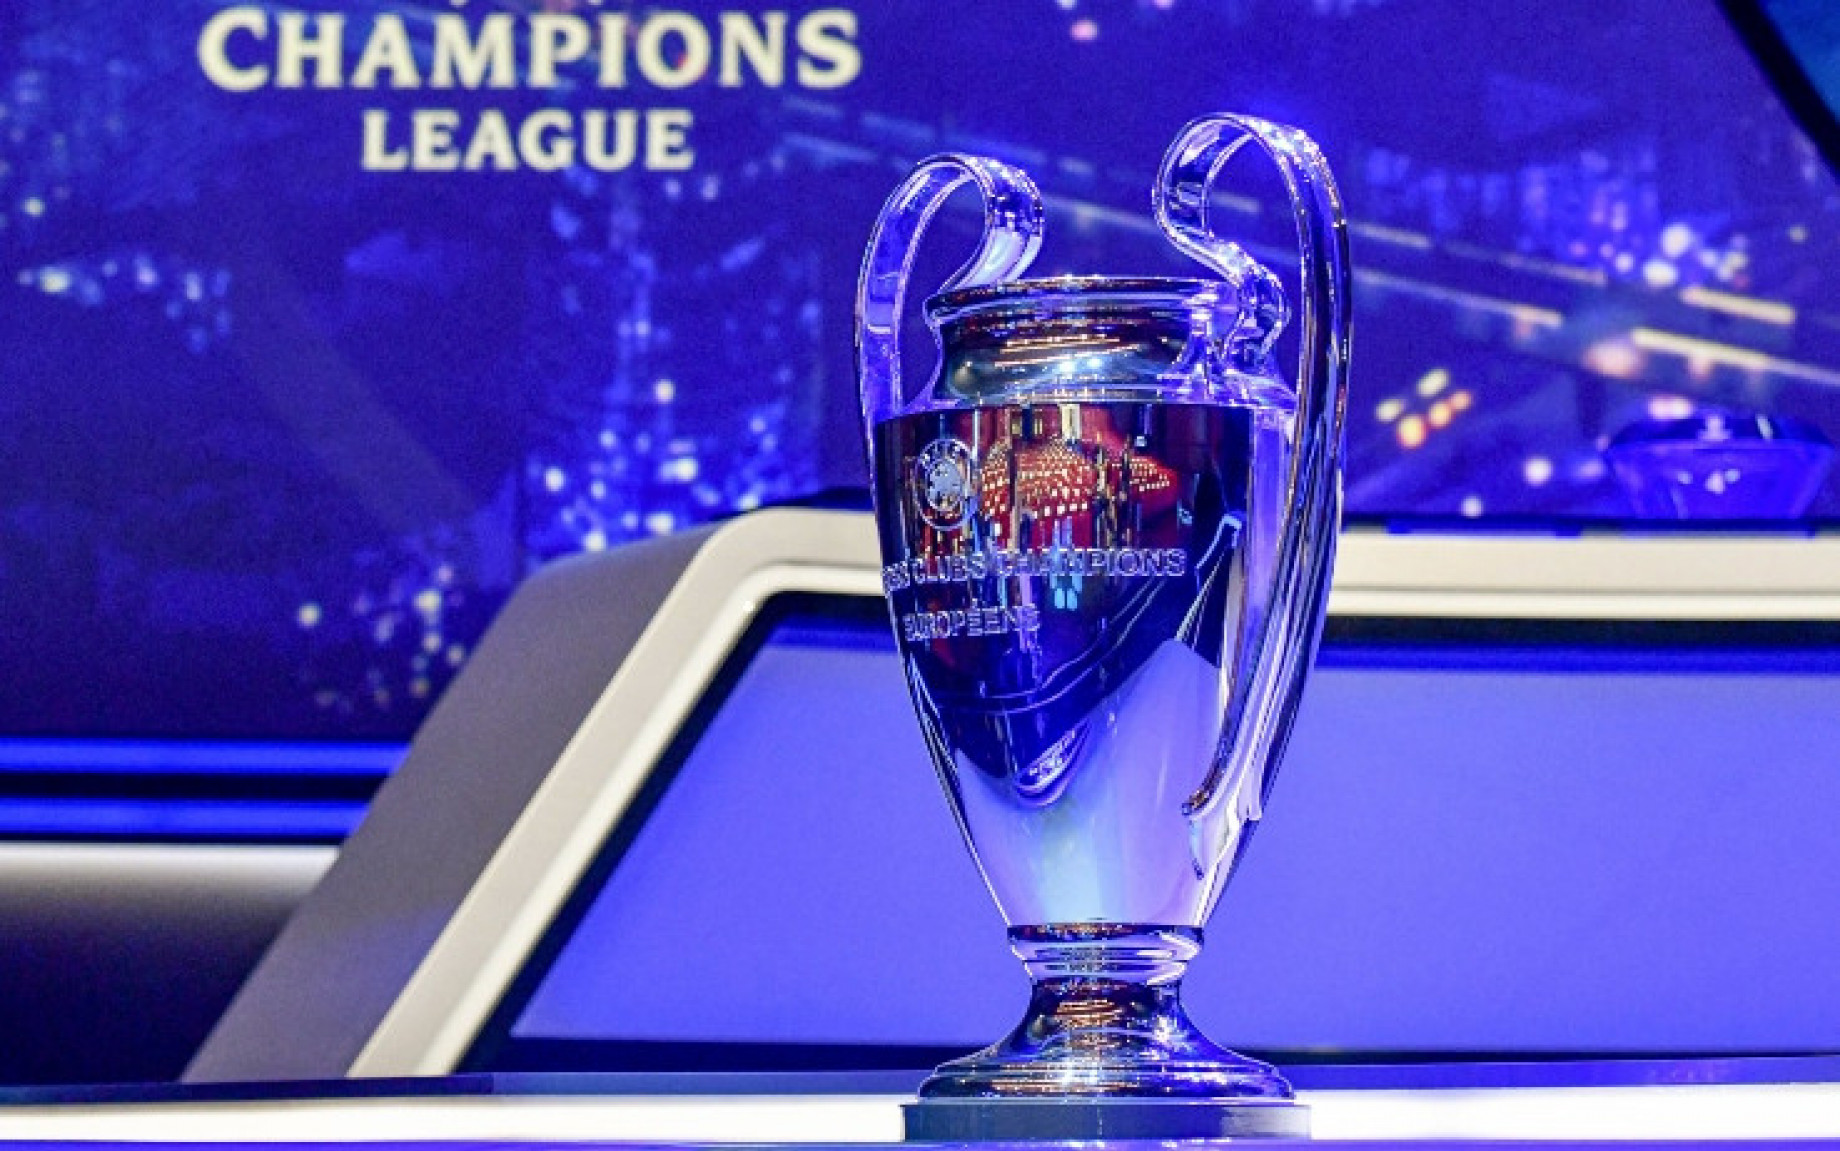 coppa-uefa-champions-league-image.jpg